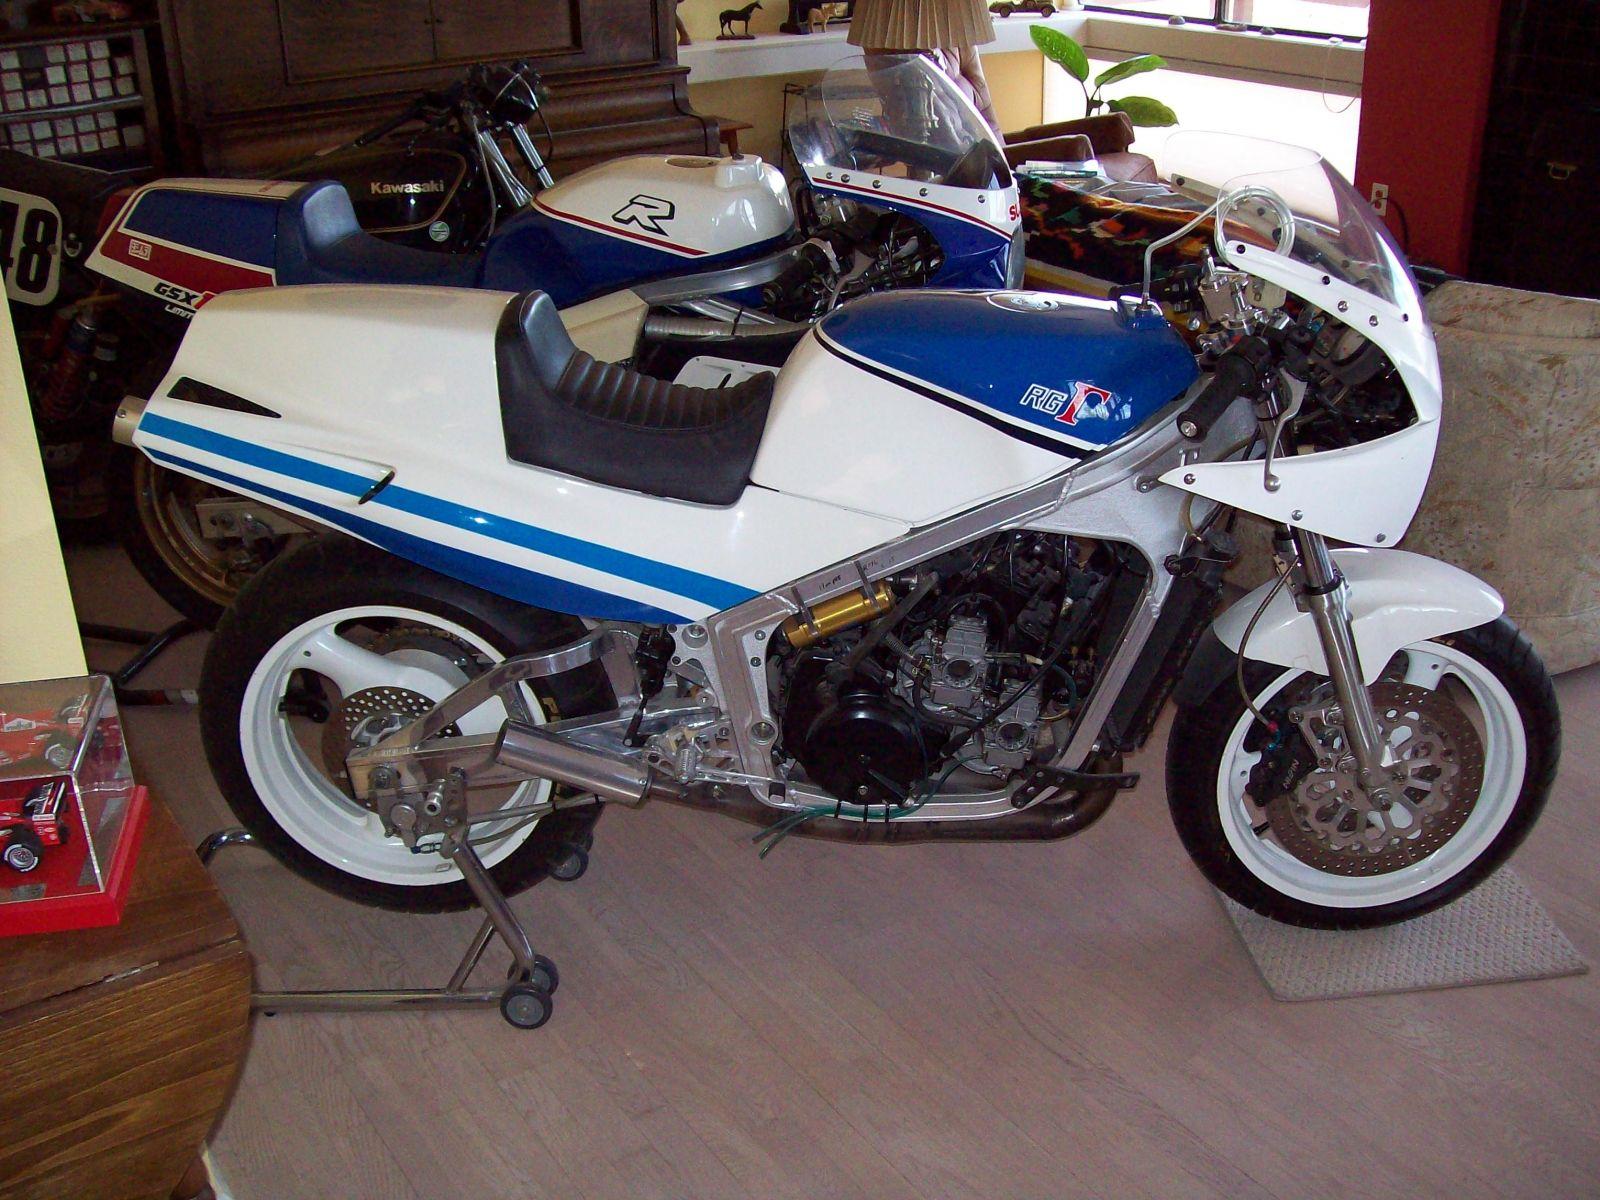 Kawasaki Motorcycle Parts 1983 Zx1100a1 Gpz Fuel Pump Diagram